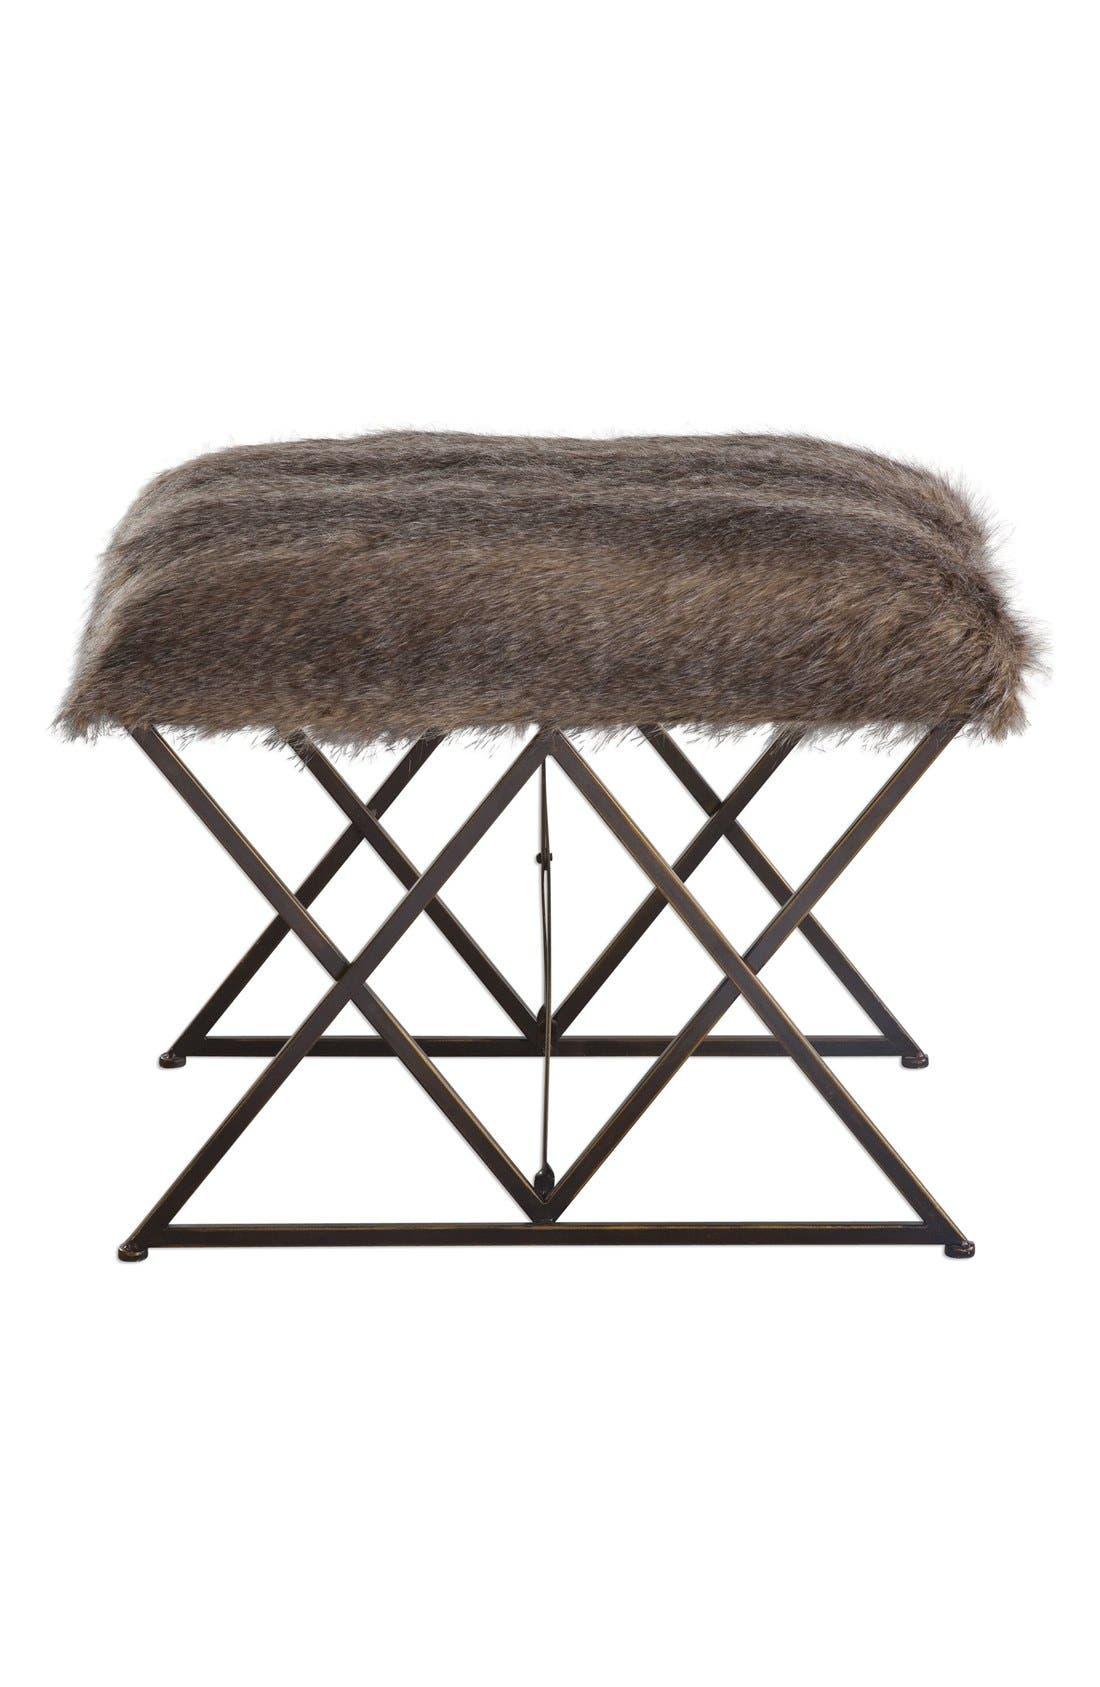 Alternate Image 1 Selected - Uttermost 'Brannen' Faux Fur Bench